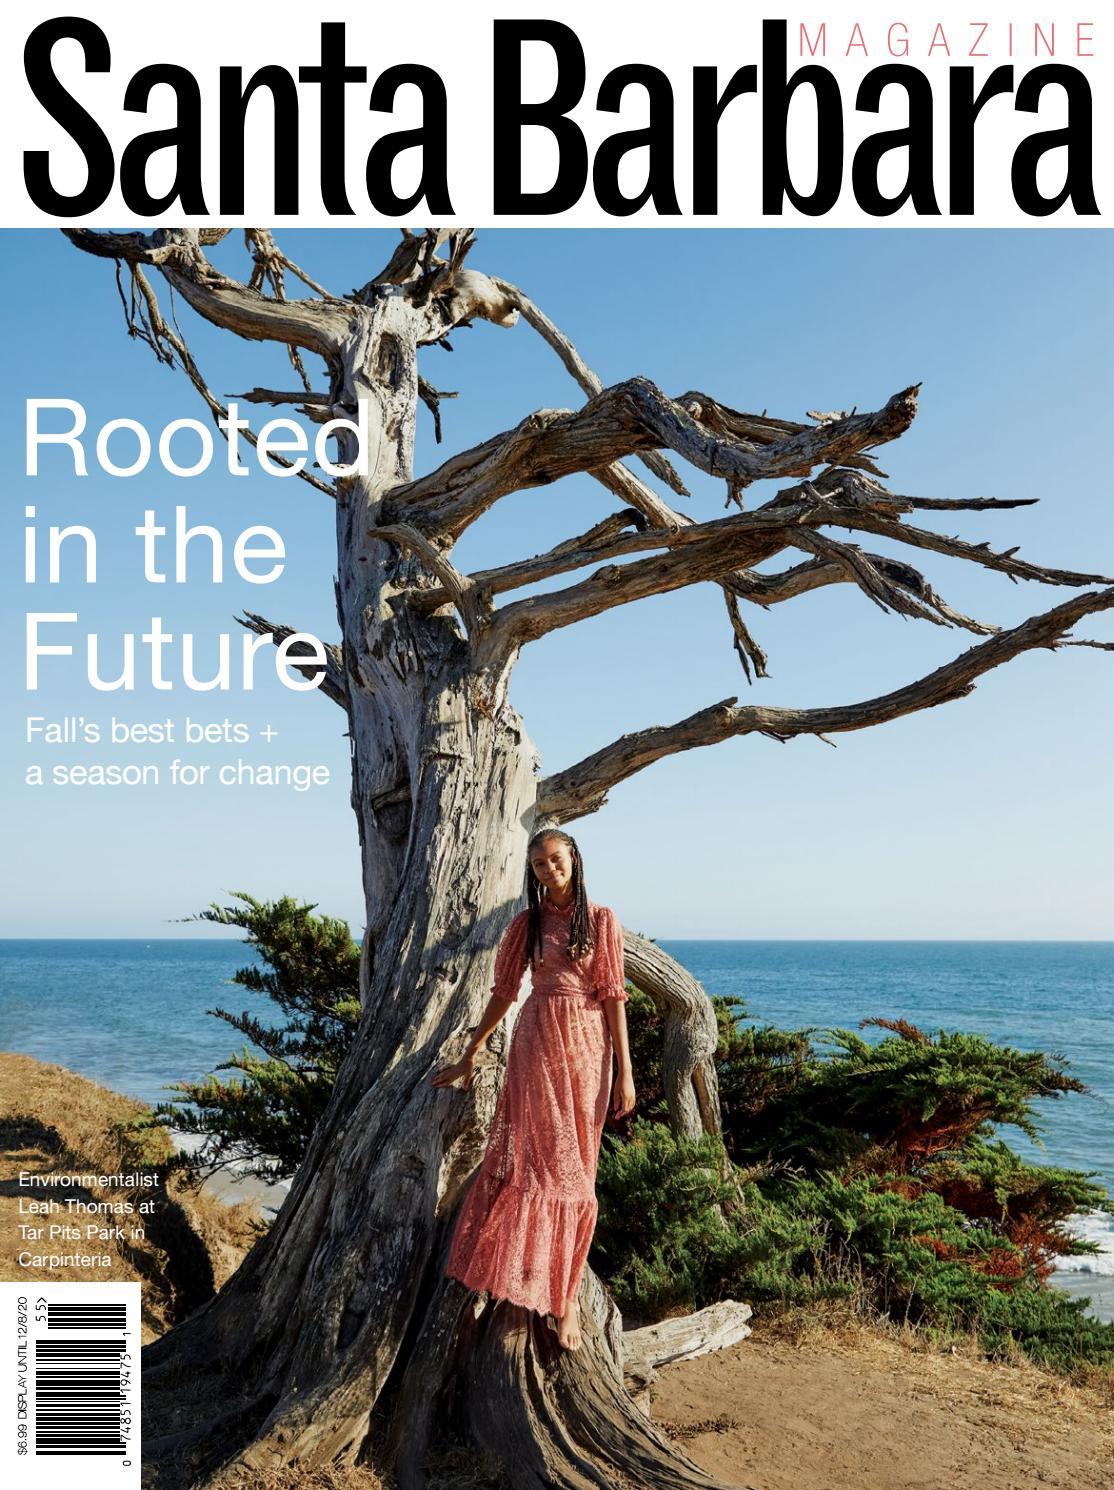 santa barbara by santa barbara magazine